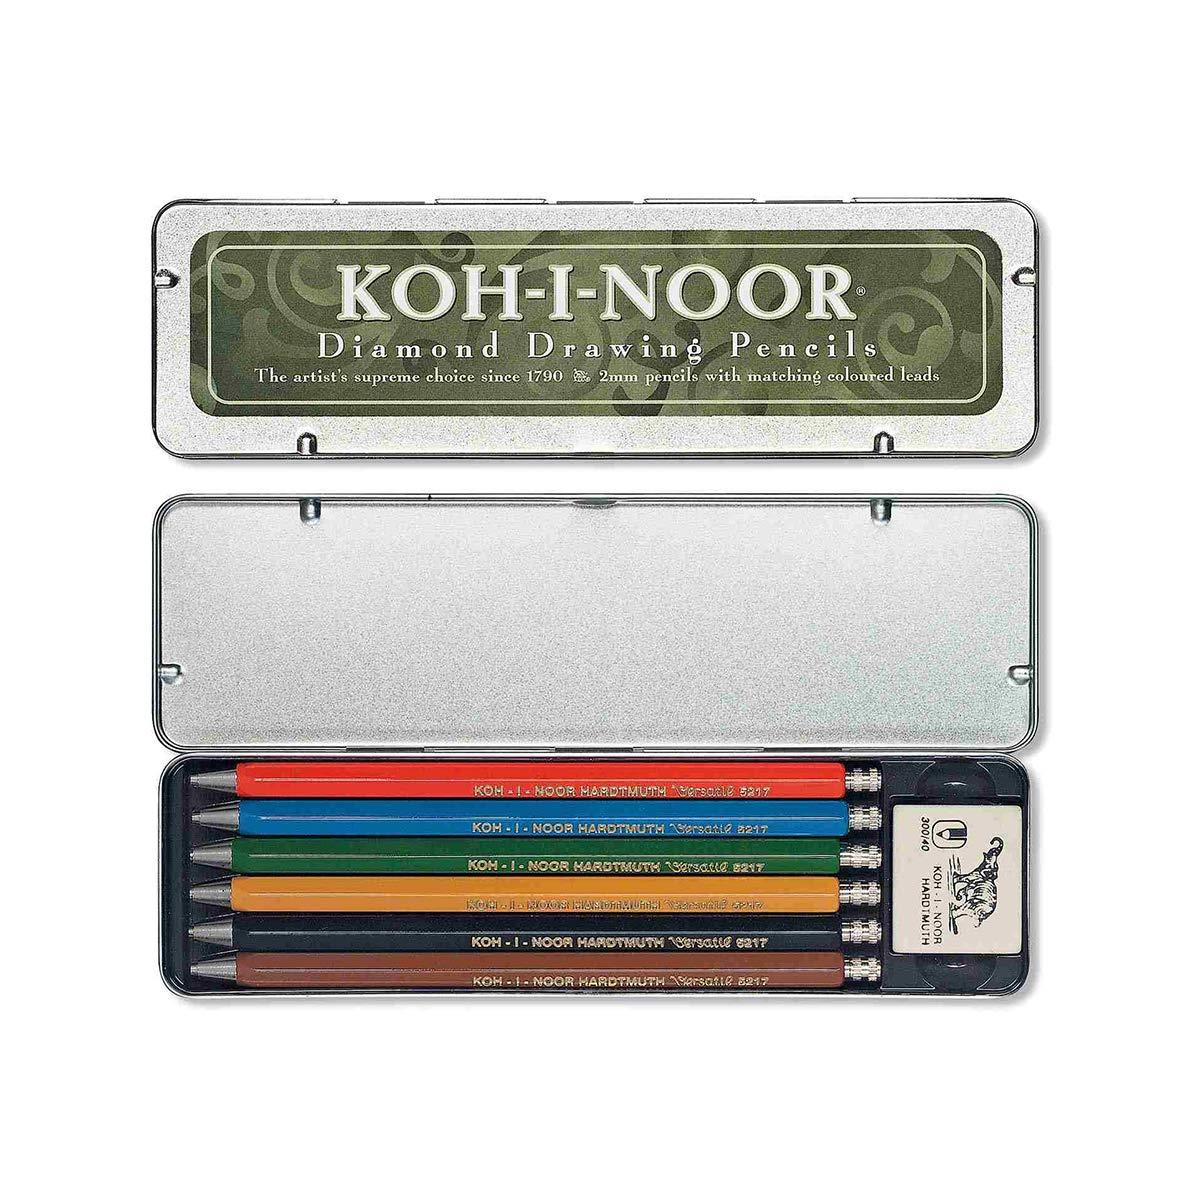 KOH-I-NOOR - Set 6 portamine in metallo colorato 52170N2001PL